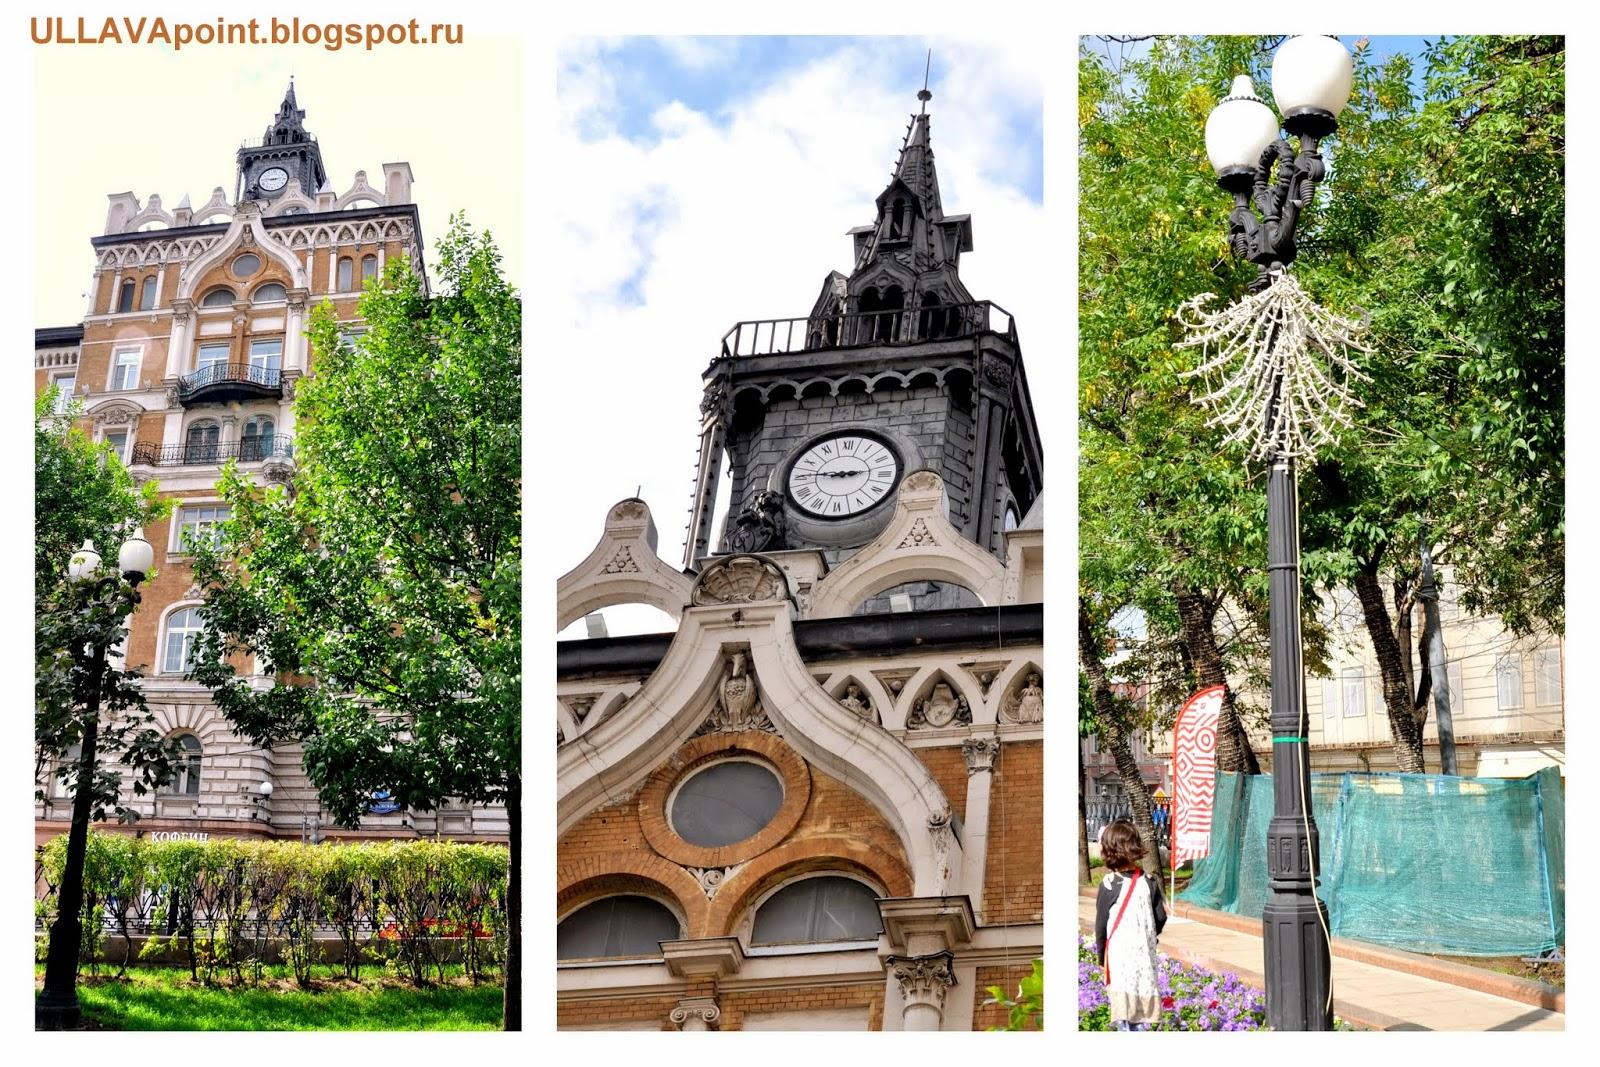 Сретенский бульвар Москва